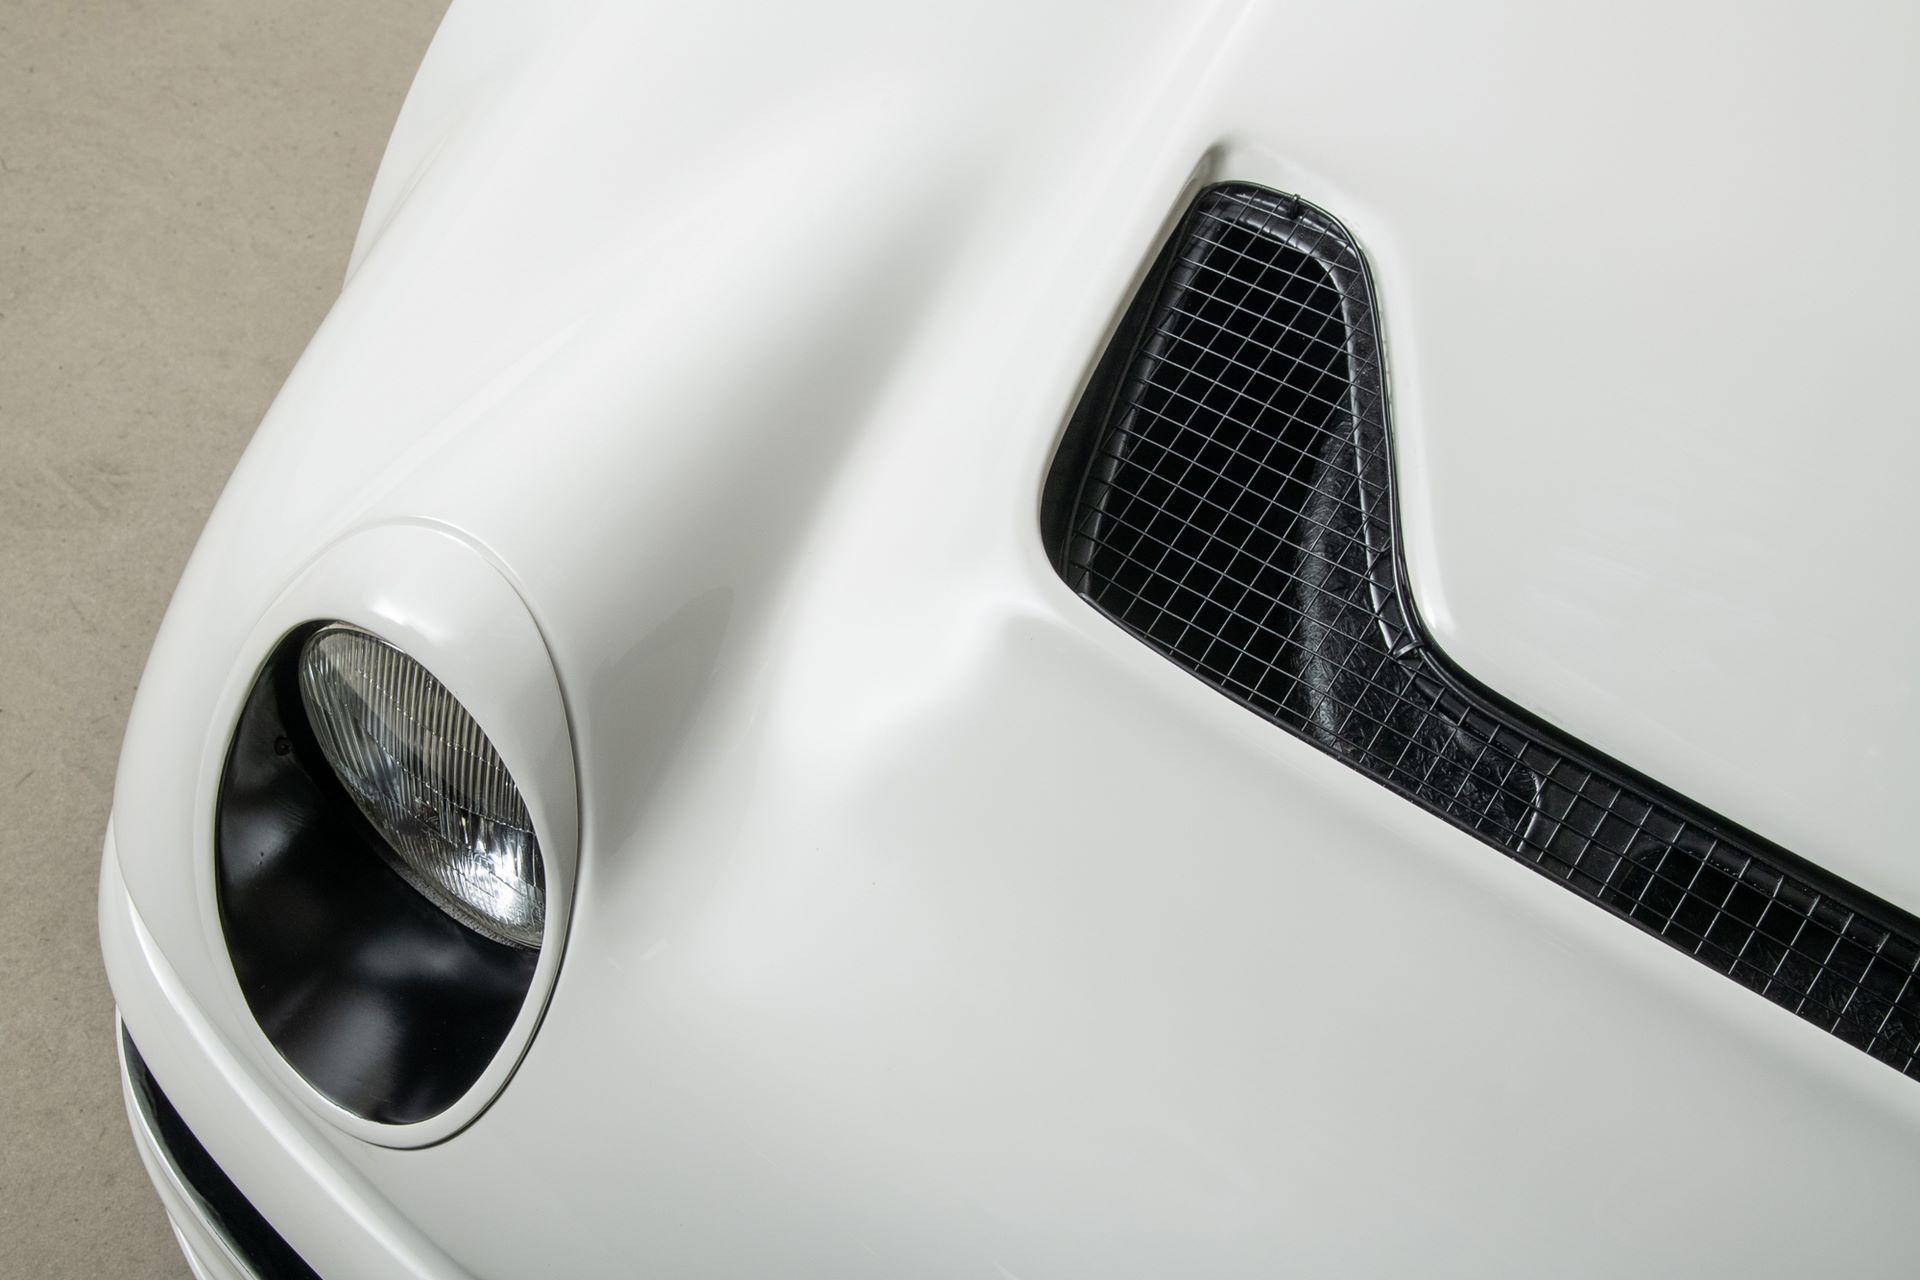 Ford-RS200-Evolution-Evo-for-sale-41